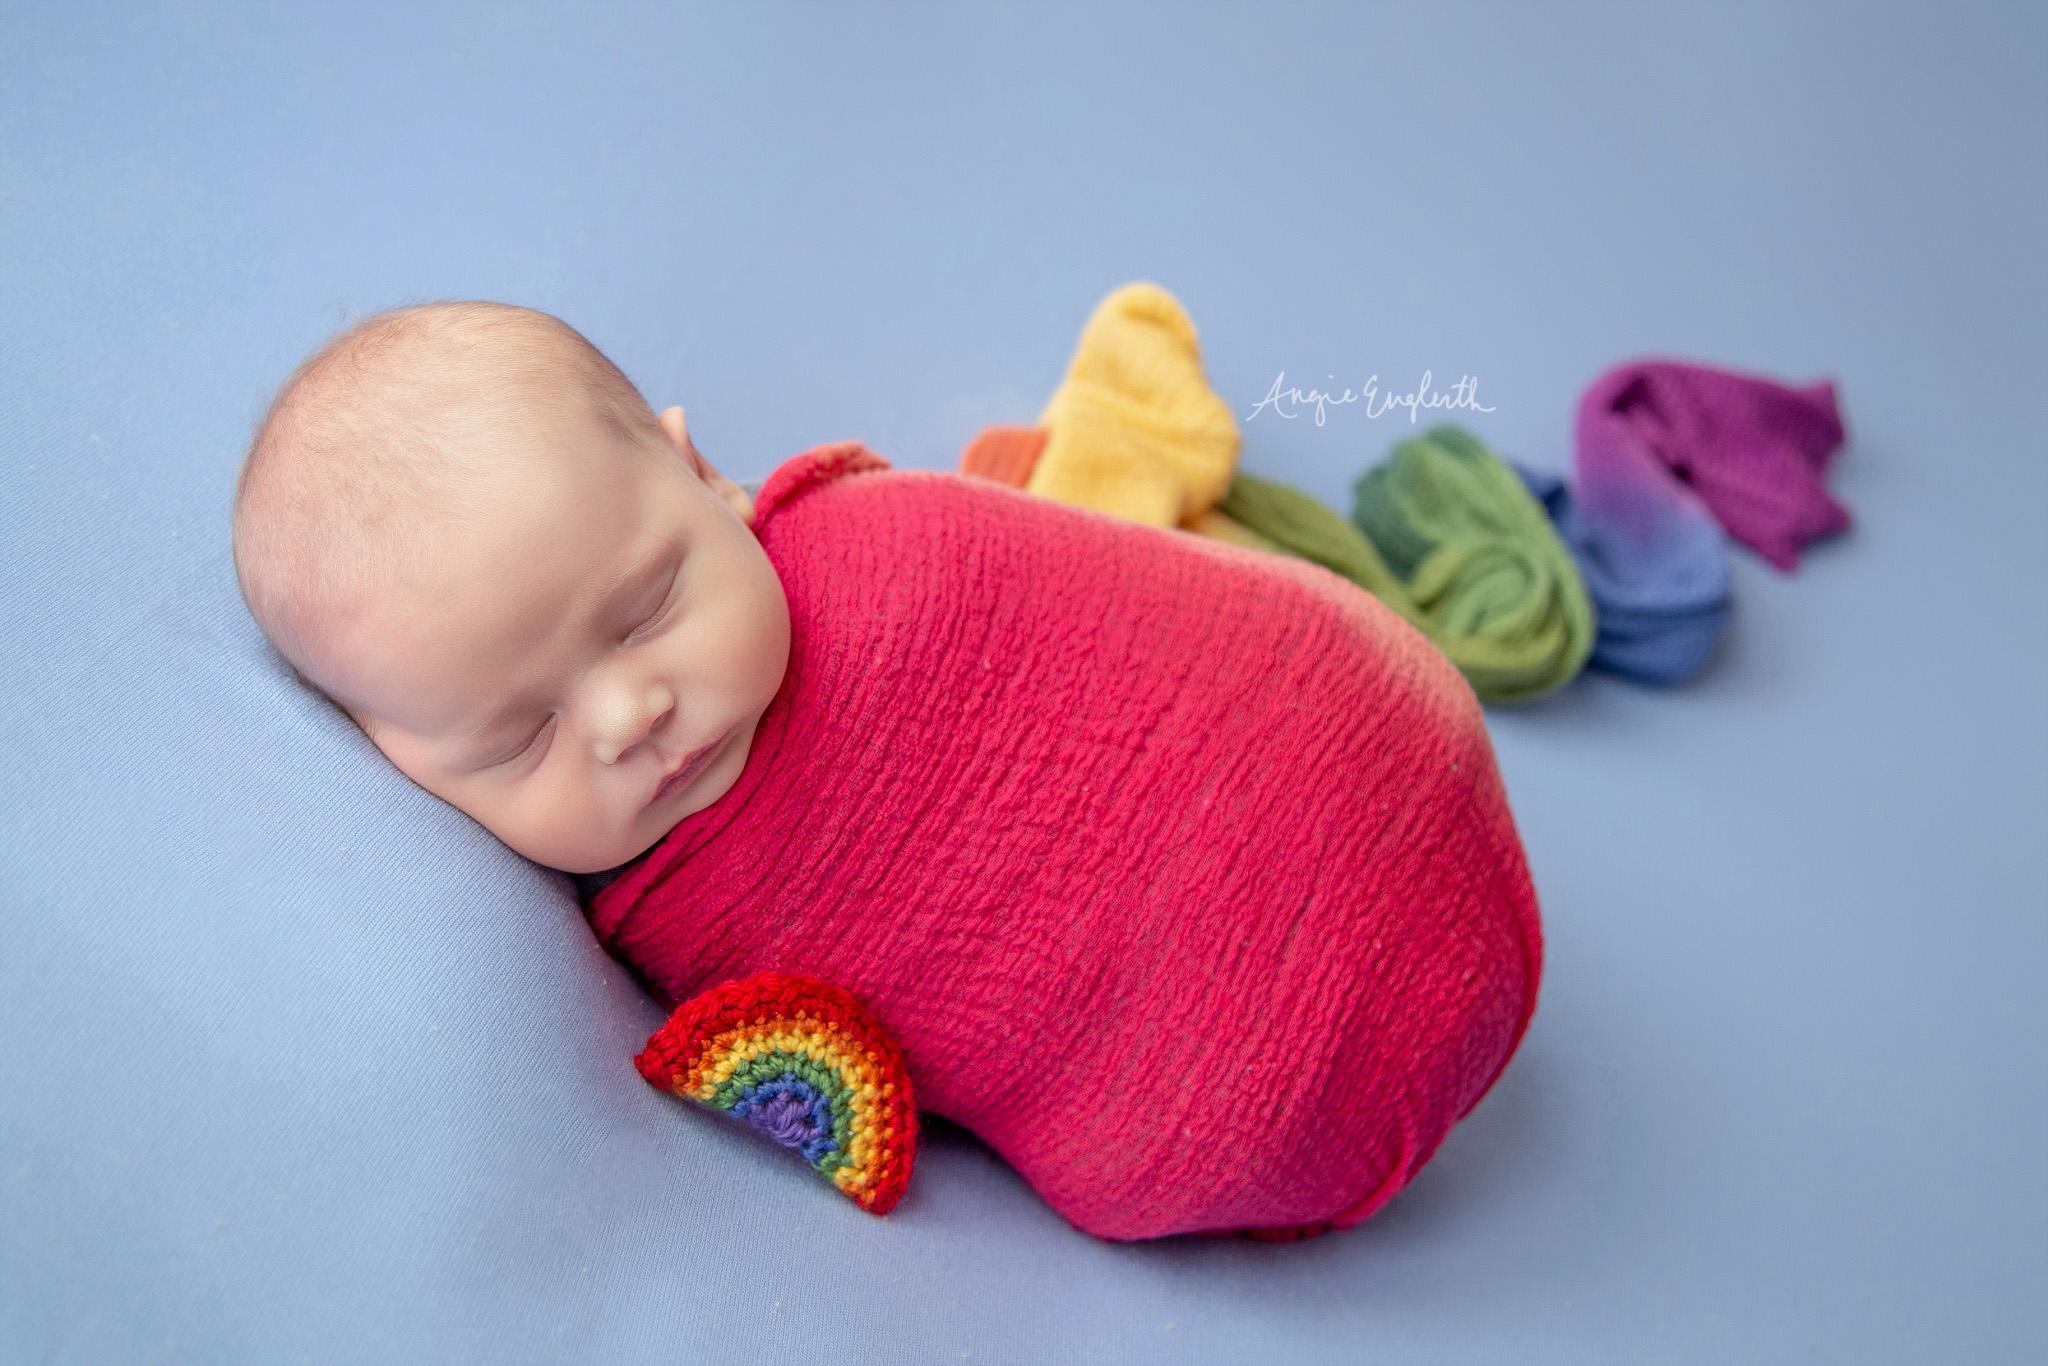 lancaster_newborn_photographer_angie_englerth_central_pa_021.jpg